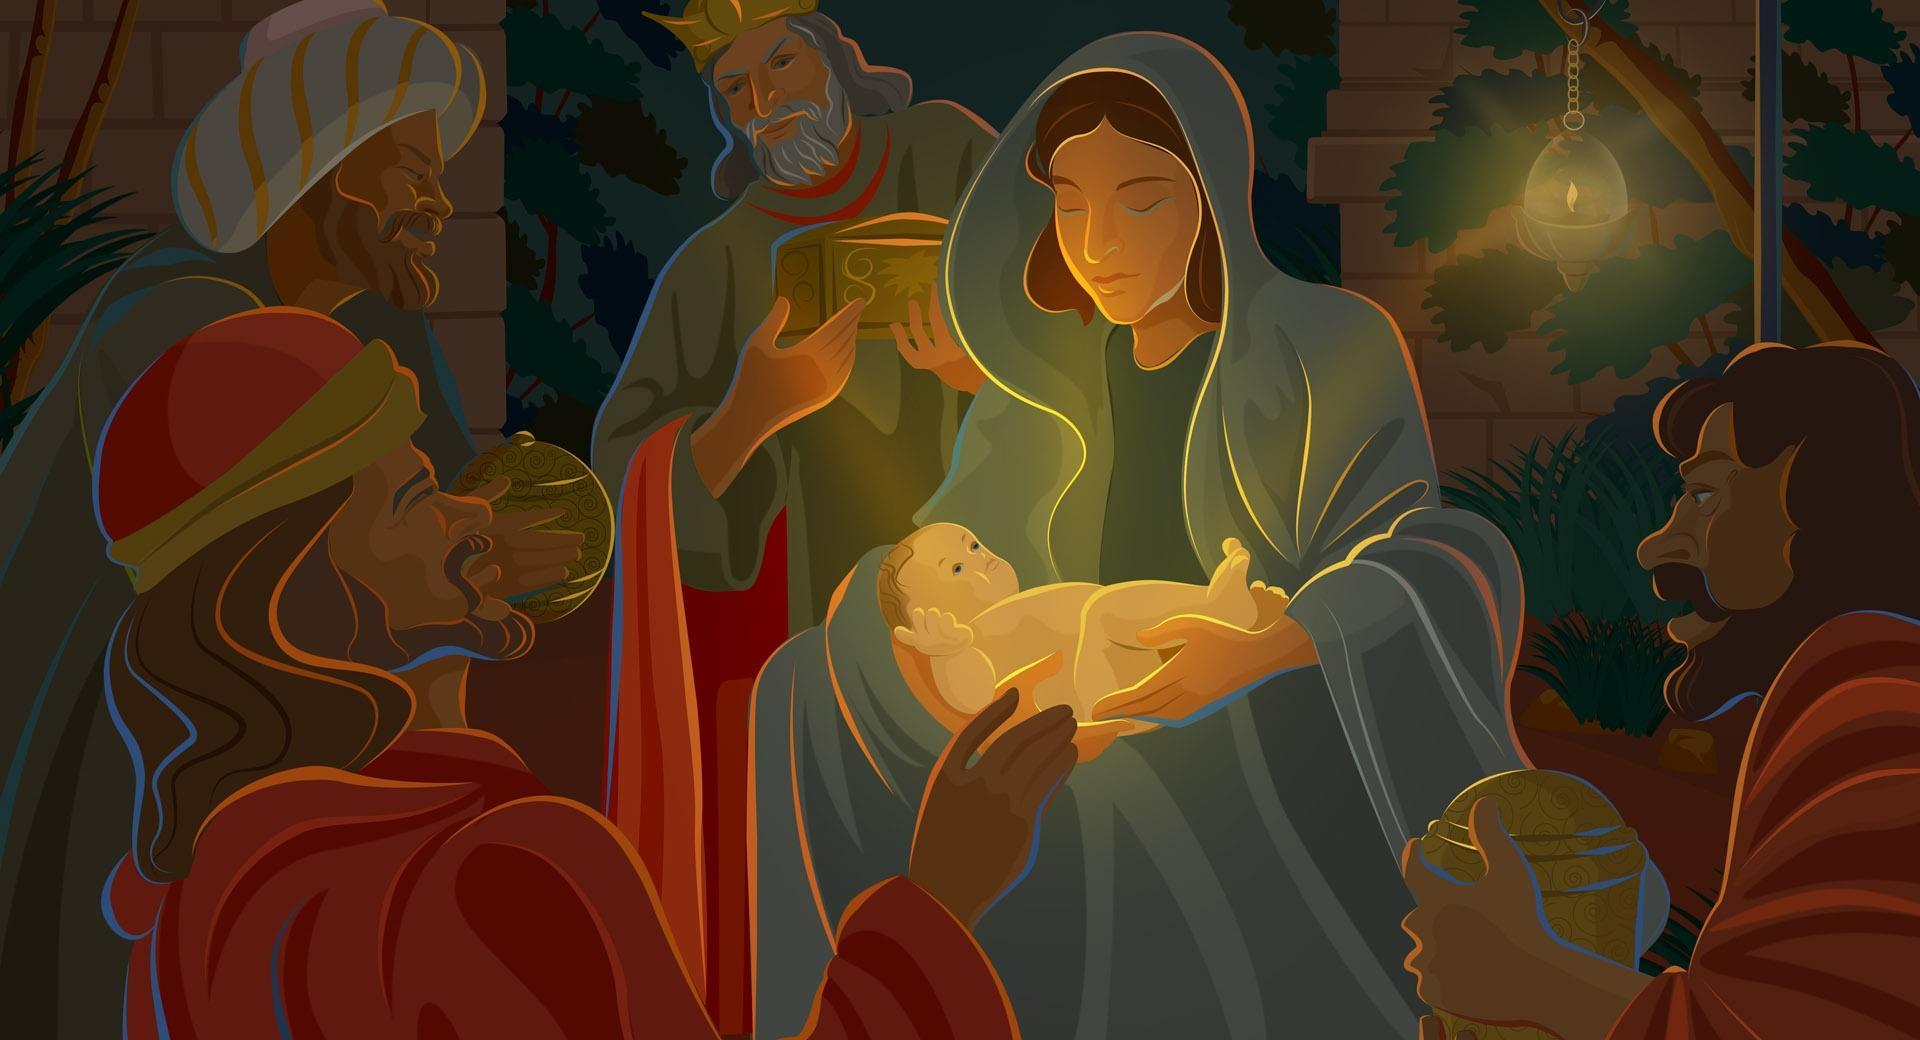 Night Of Jesus Christ Birth wallpapers HD quality